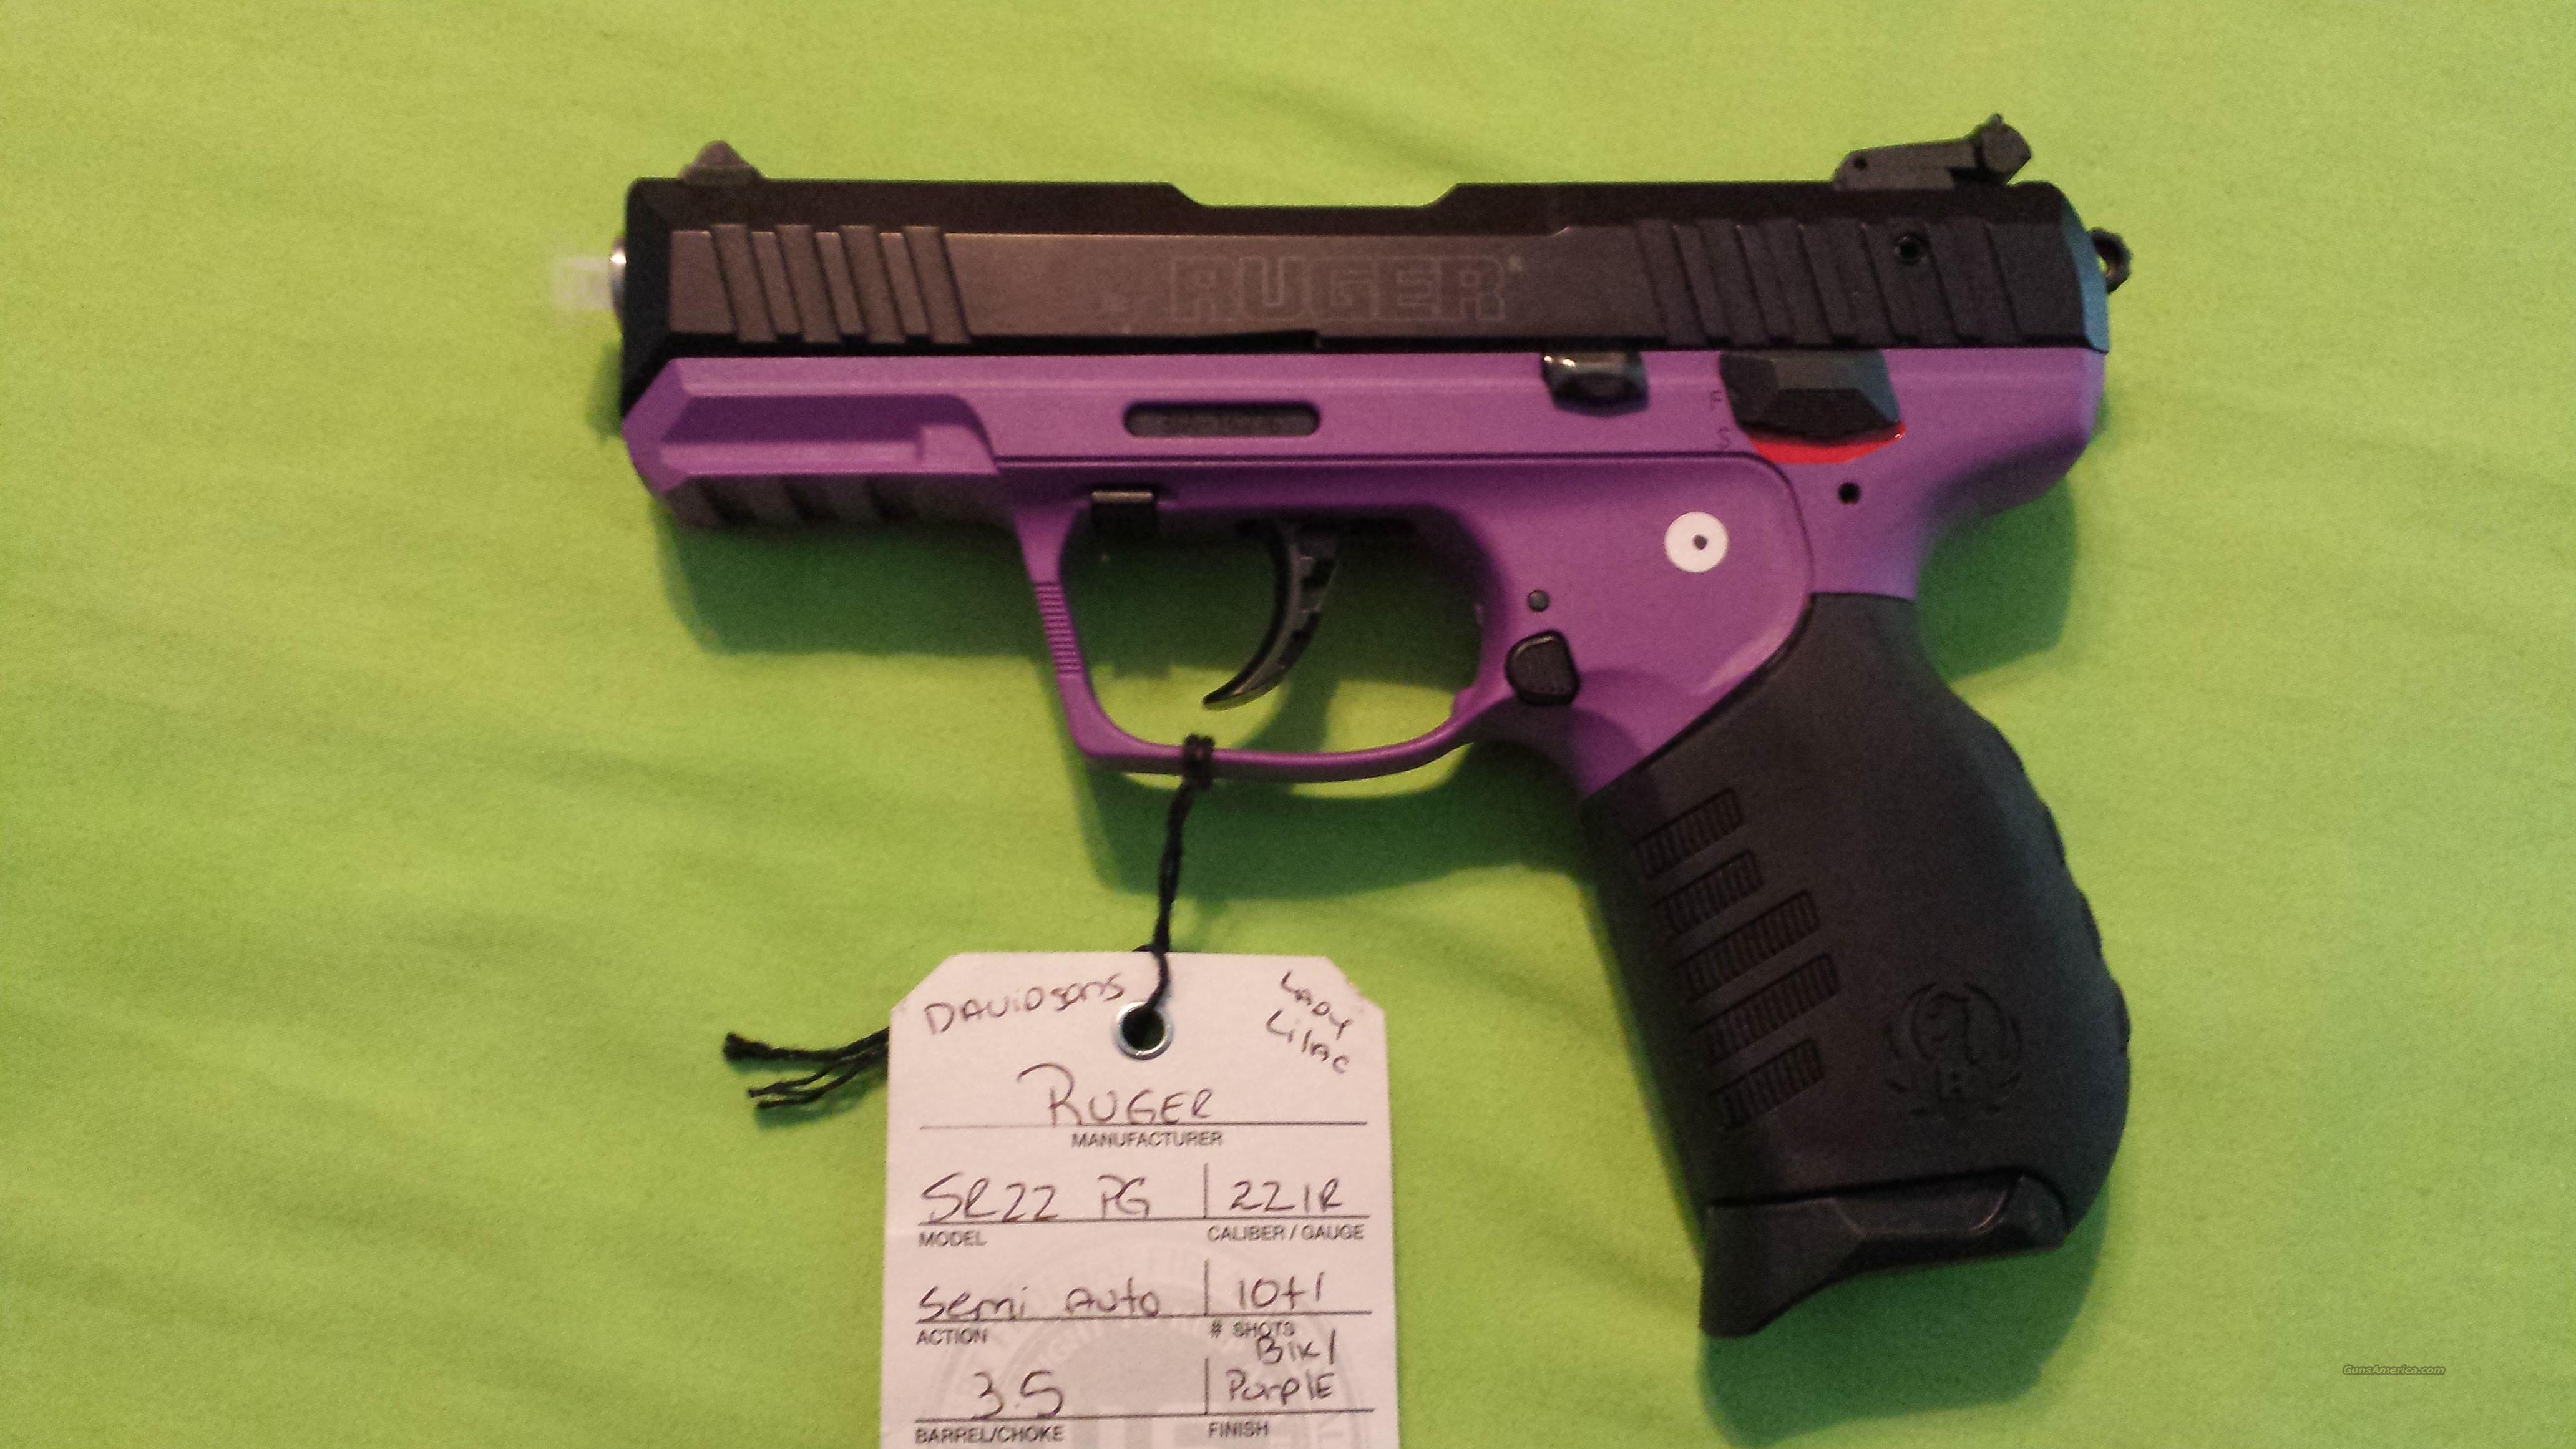 Ruger SR22-PG 22LR 22 Lady Lilac Talo Edition Purple  Guns > Pistols > Ruger Semi-Auto Pistols > SR Family > SR22